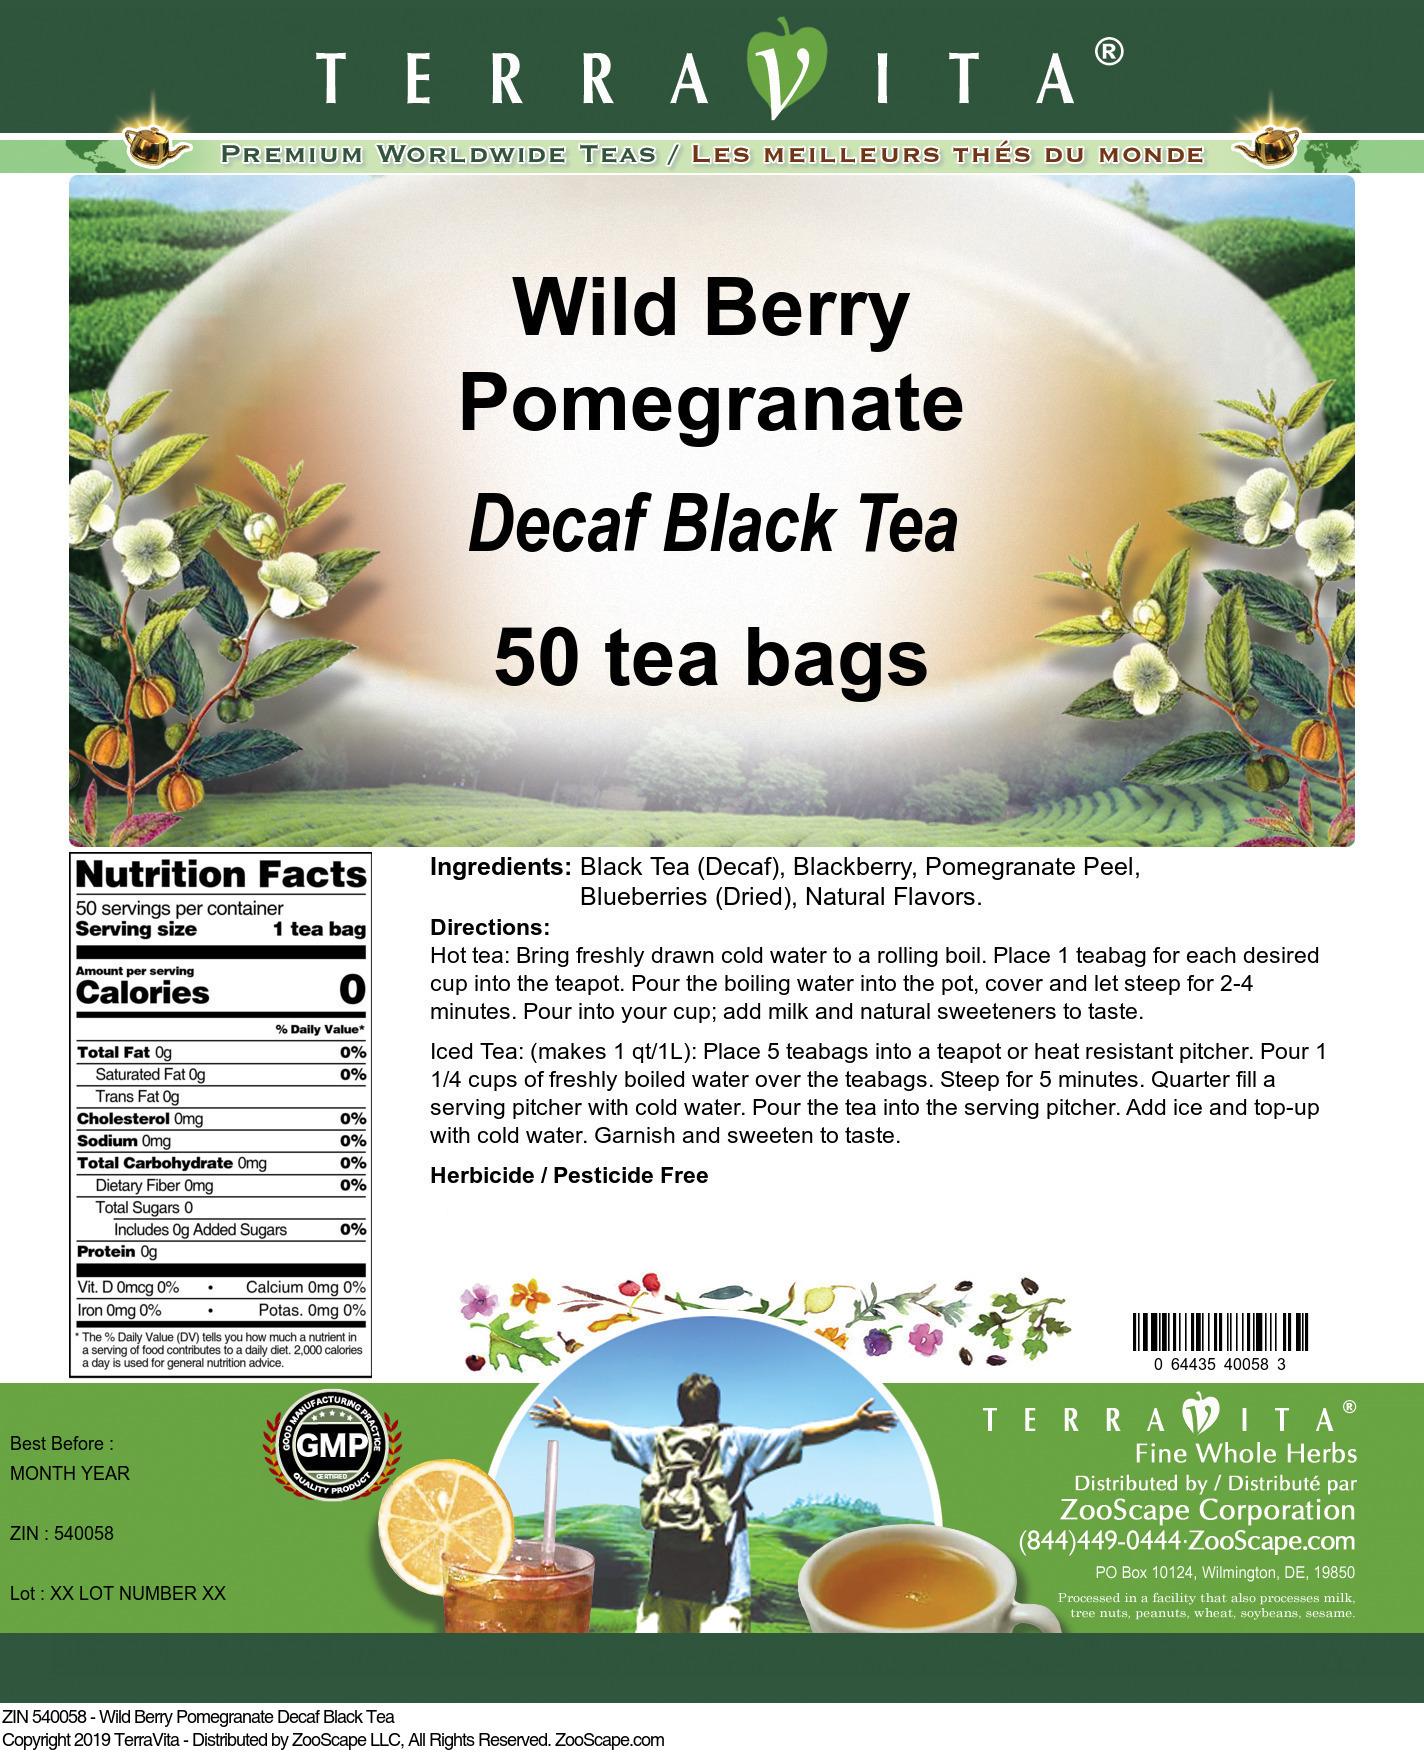 Wild Berry Pomegranate Decaf Black Tea